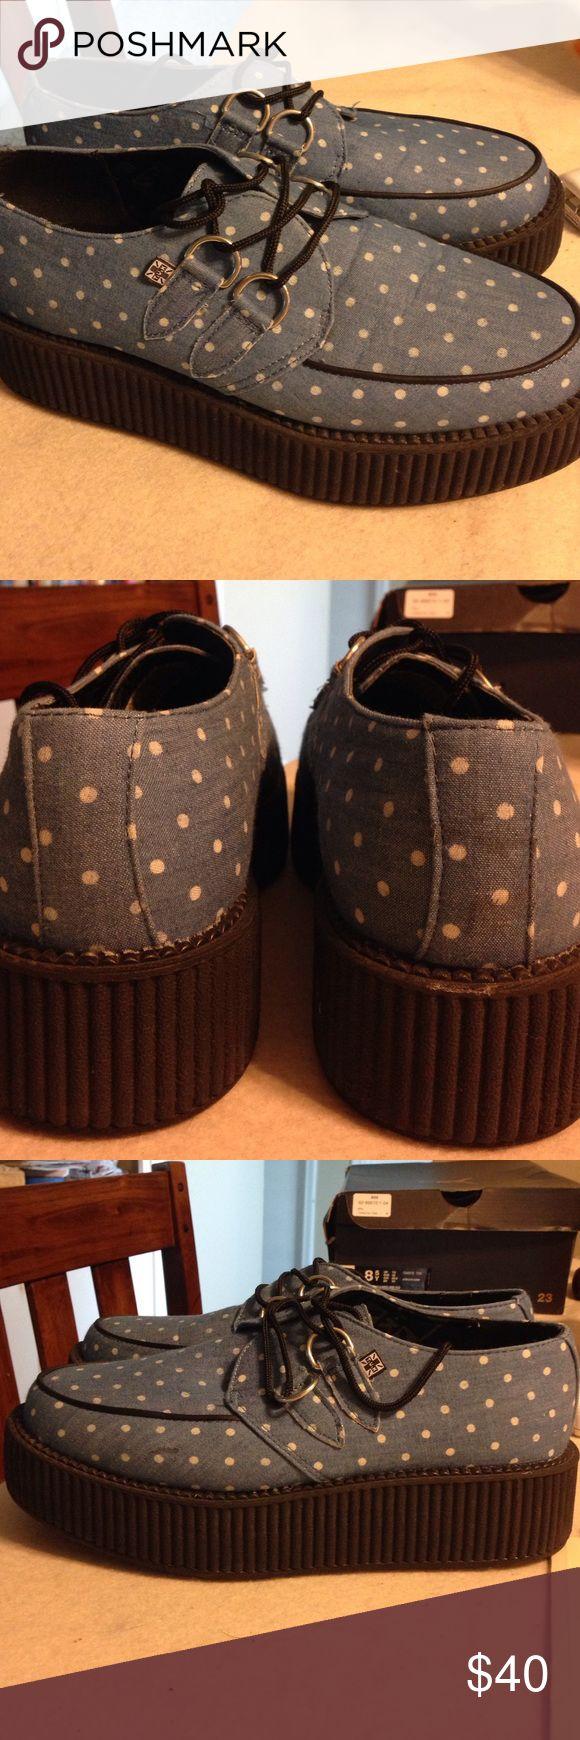 TUK Creepers. Denim polka dots. Denim upper with white polka dots. 2 inch platform. t.u.k Shoes Platforms